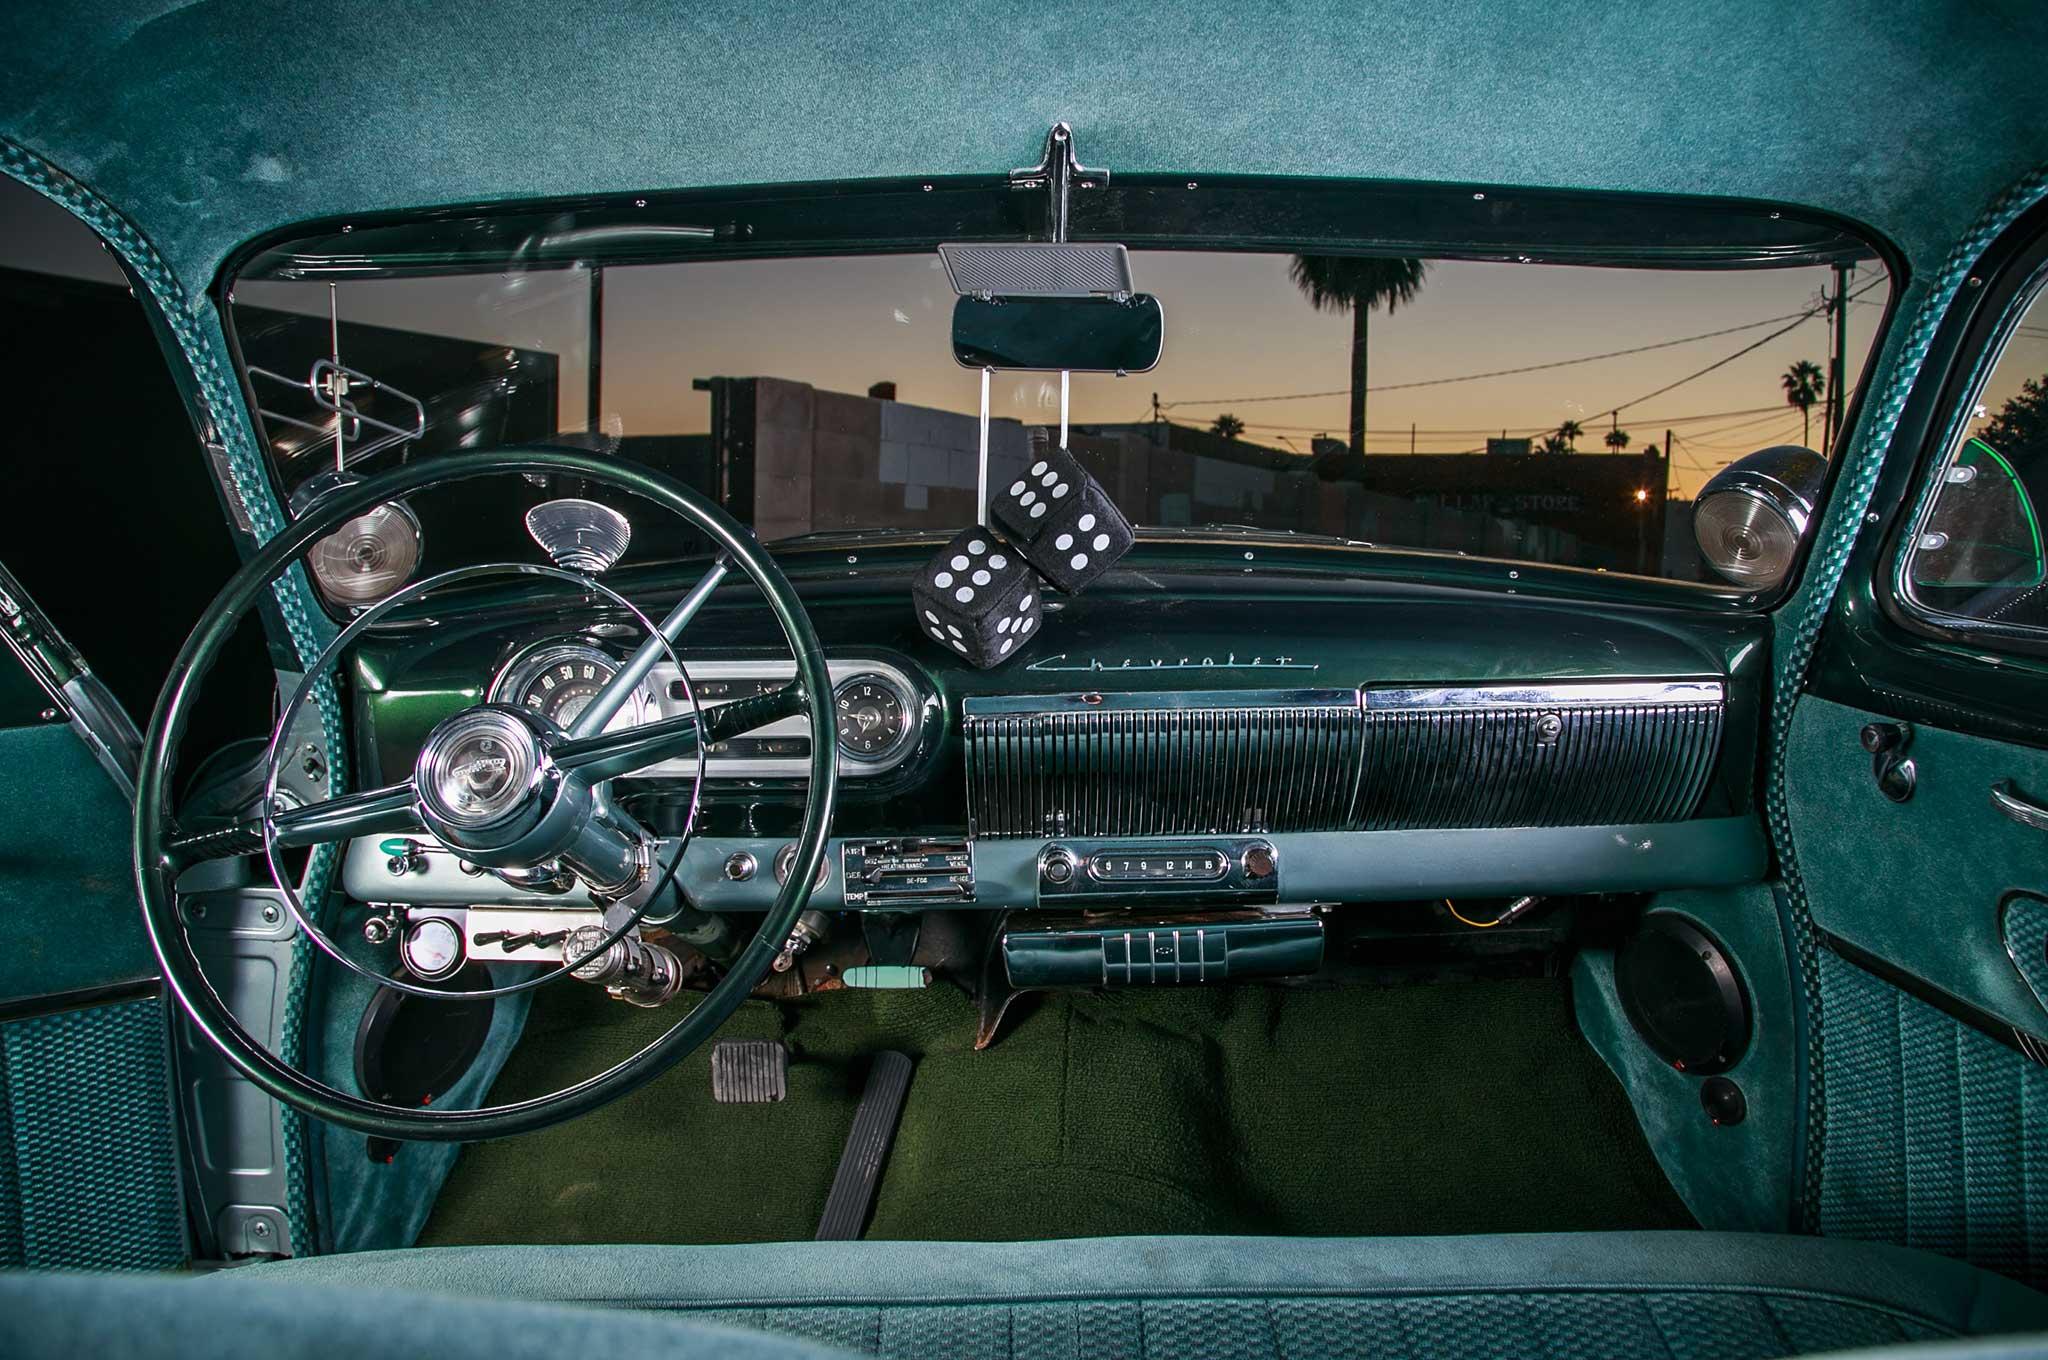 1953 Chevy 210 - High School Sweetheart